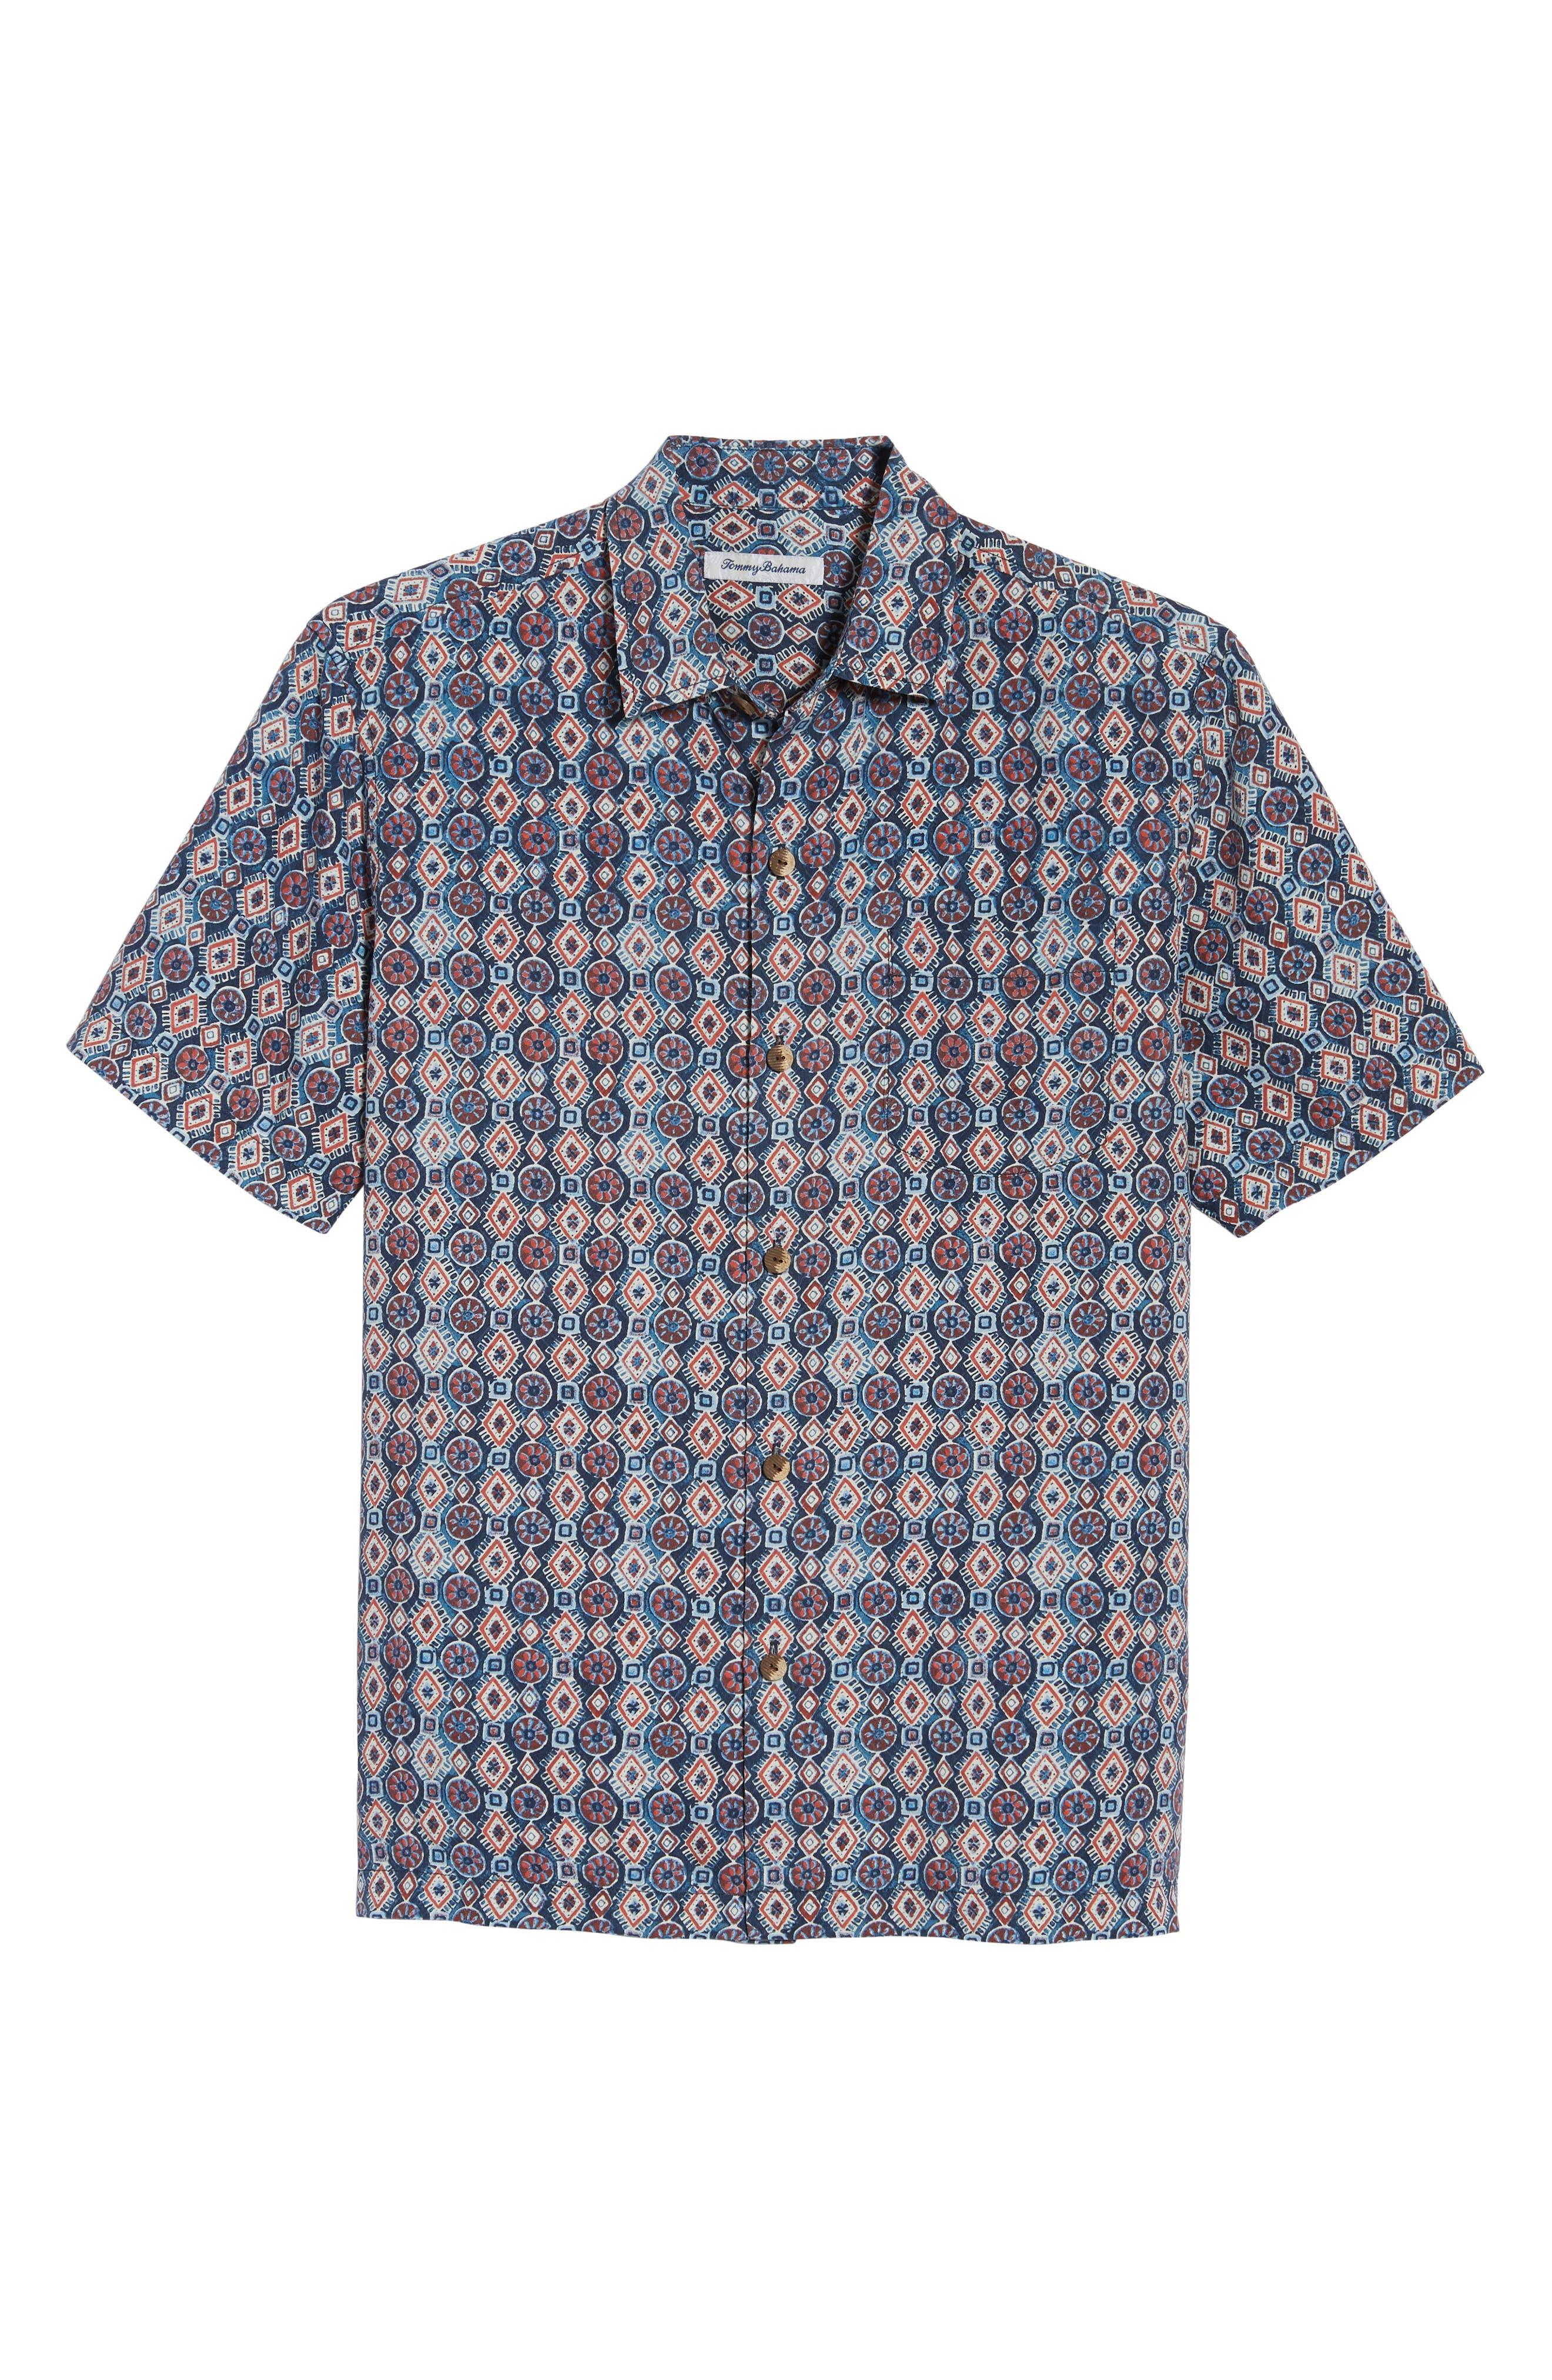 Tulum Tiles Silk Camp Shirt,                             Alternate thumbnail 6, color,                             Ocean Deep